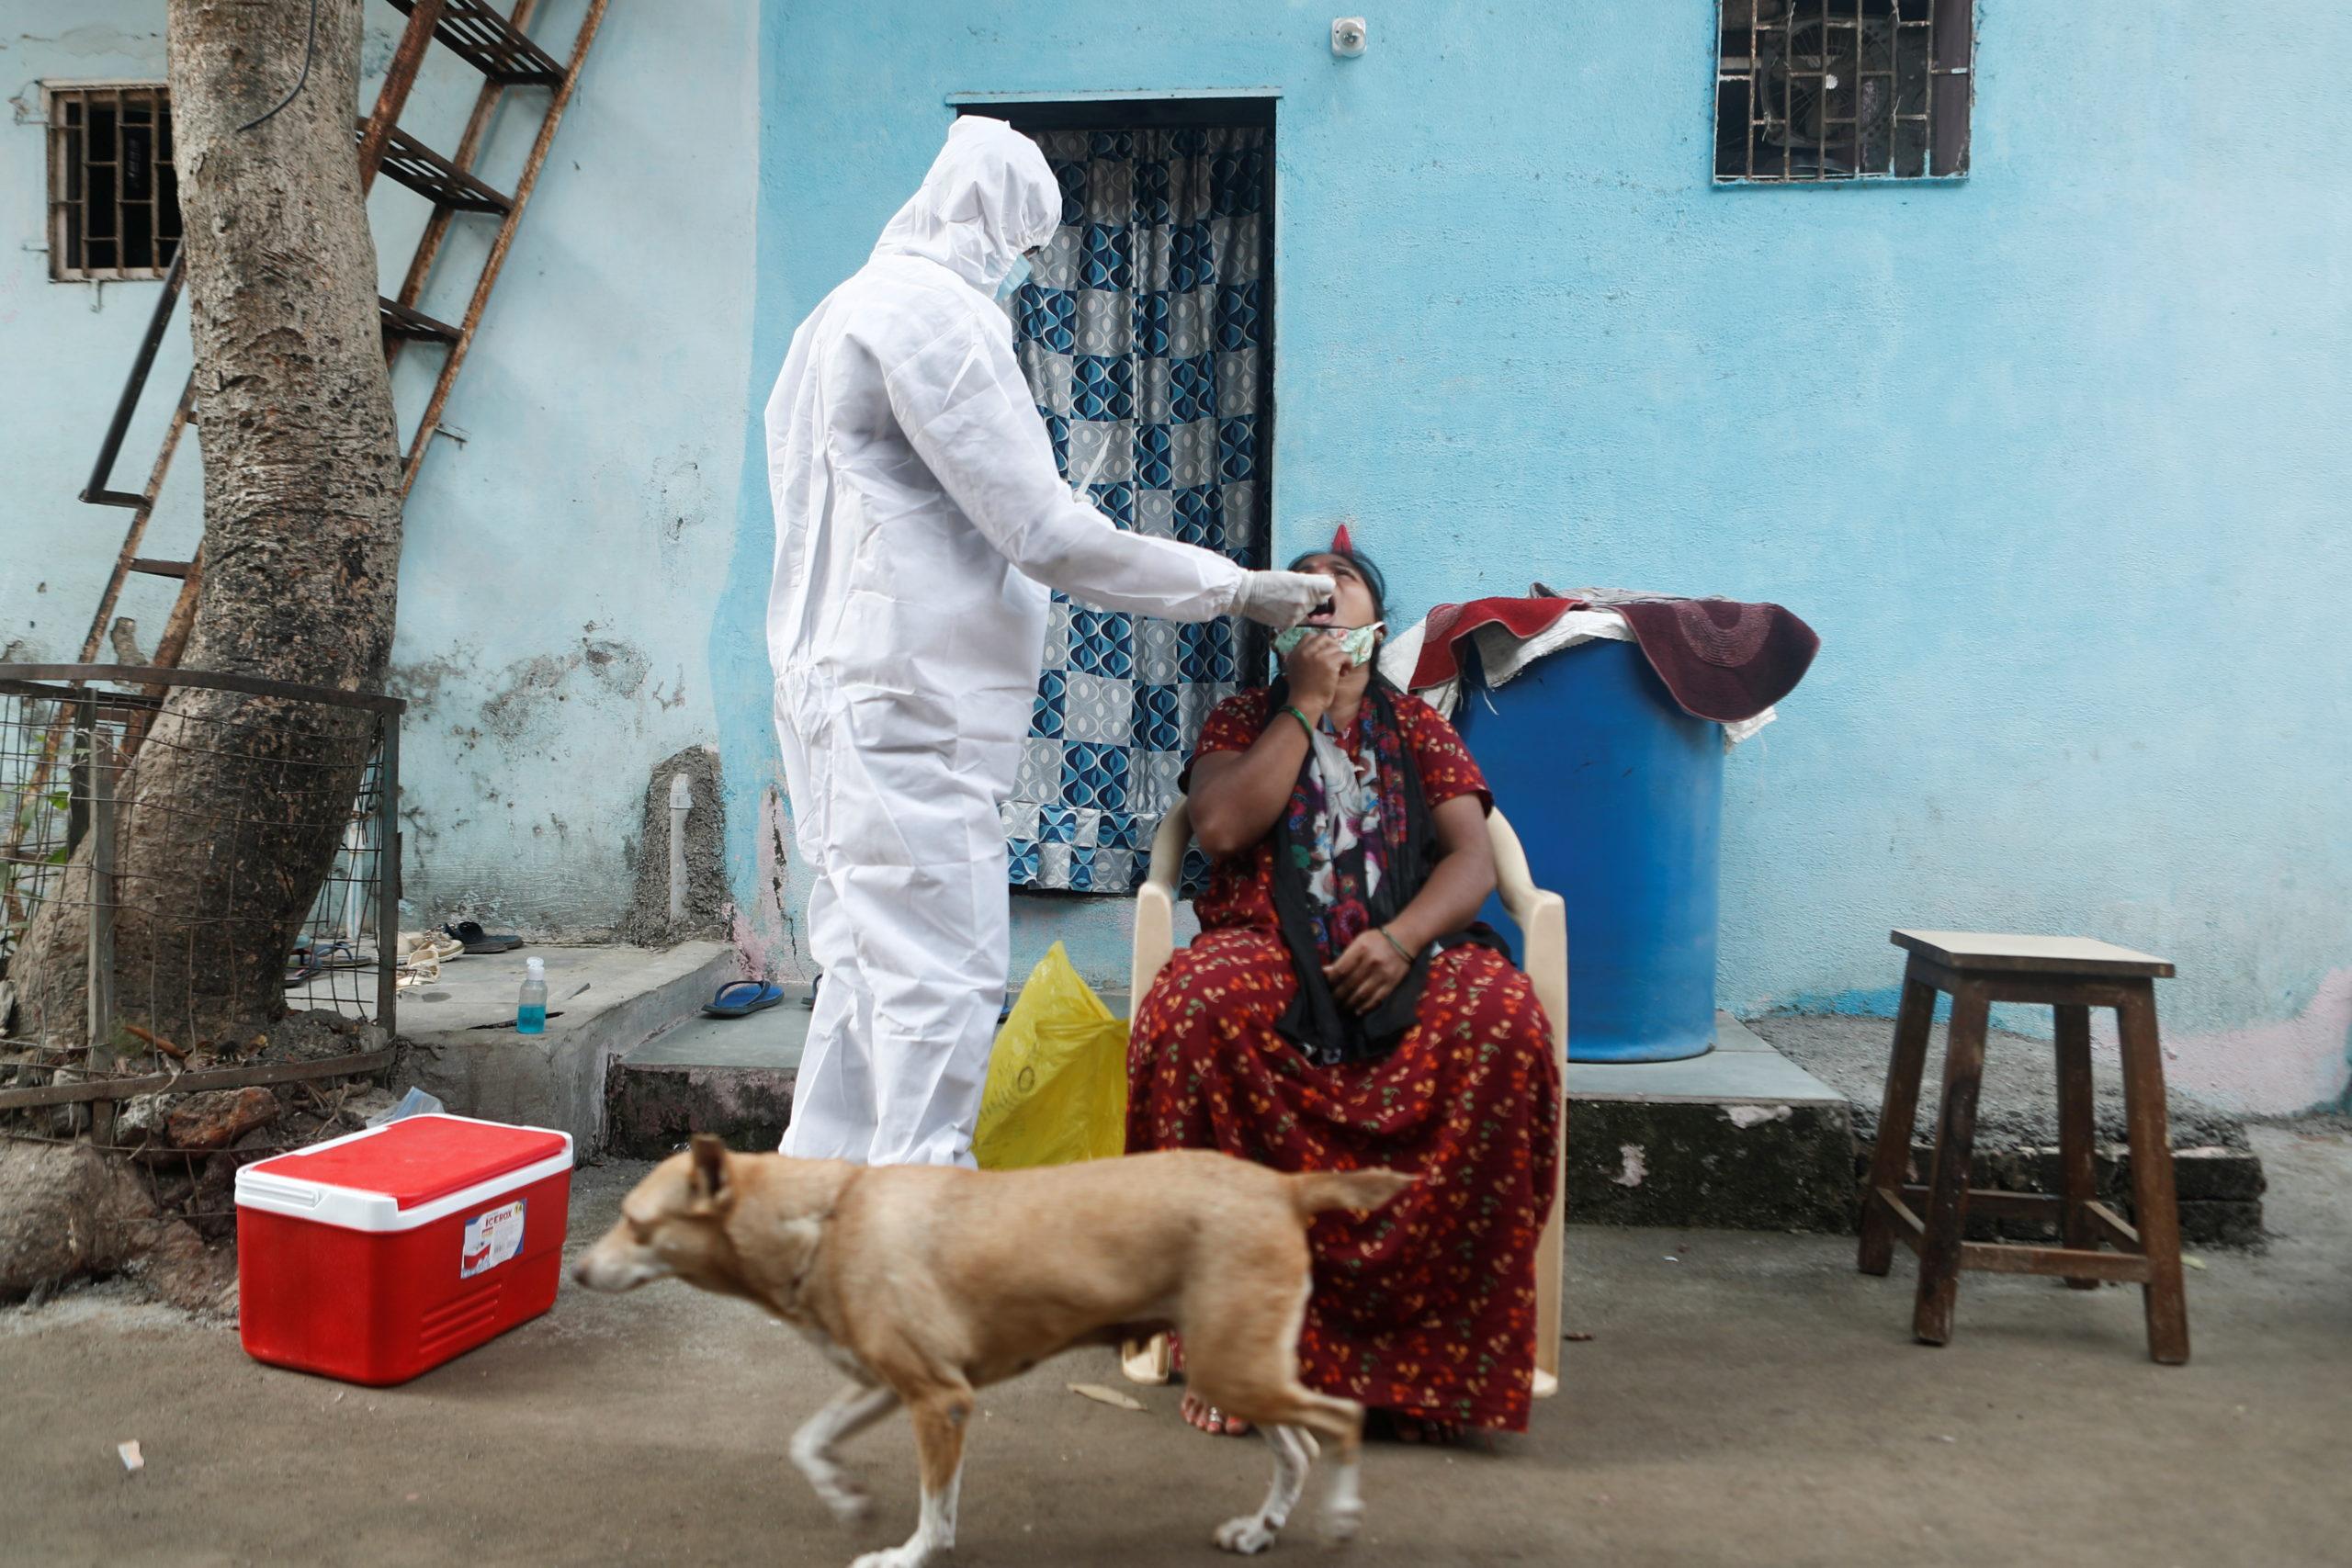 Virus Variants May Not Be Behind COVID-19 Upsurge in Maharashtra, Kerala – The Wire Science